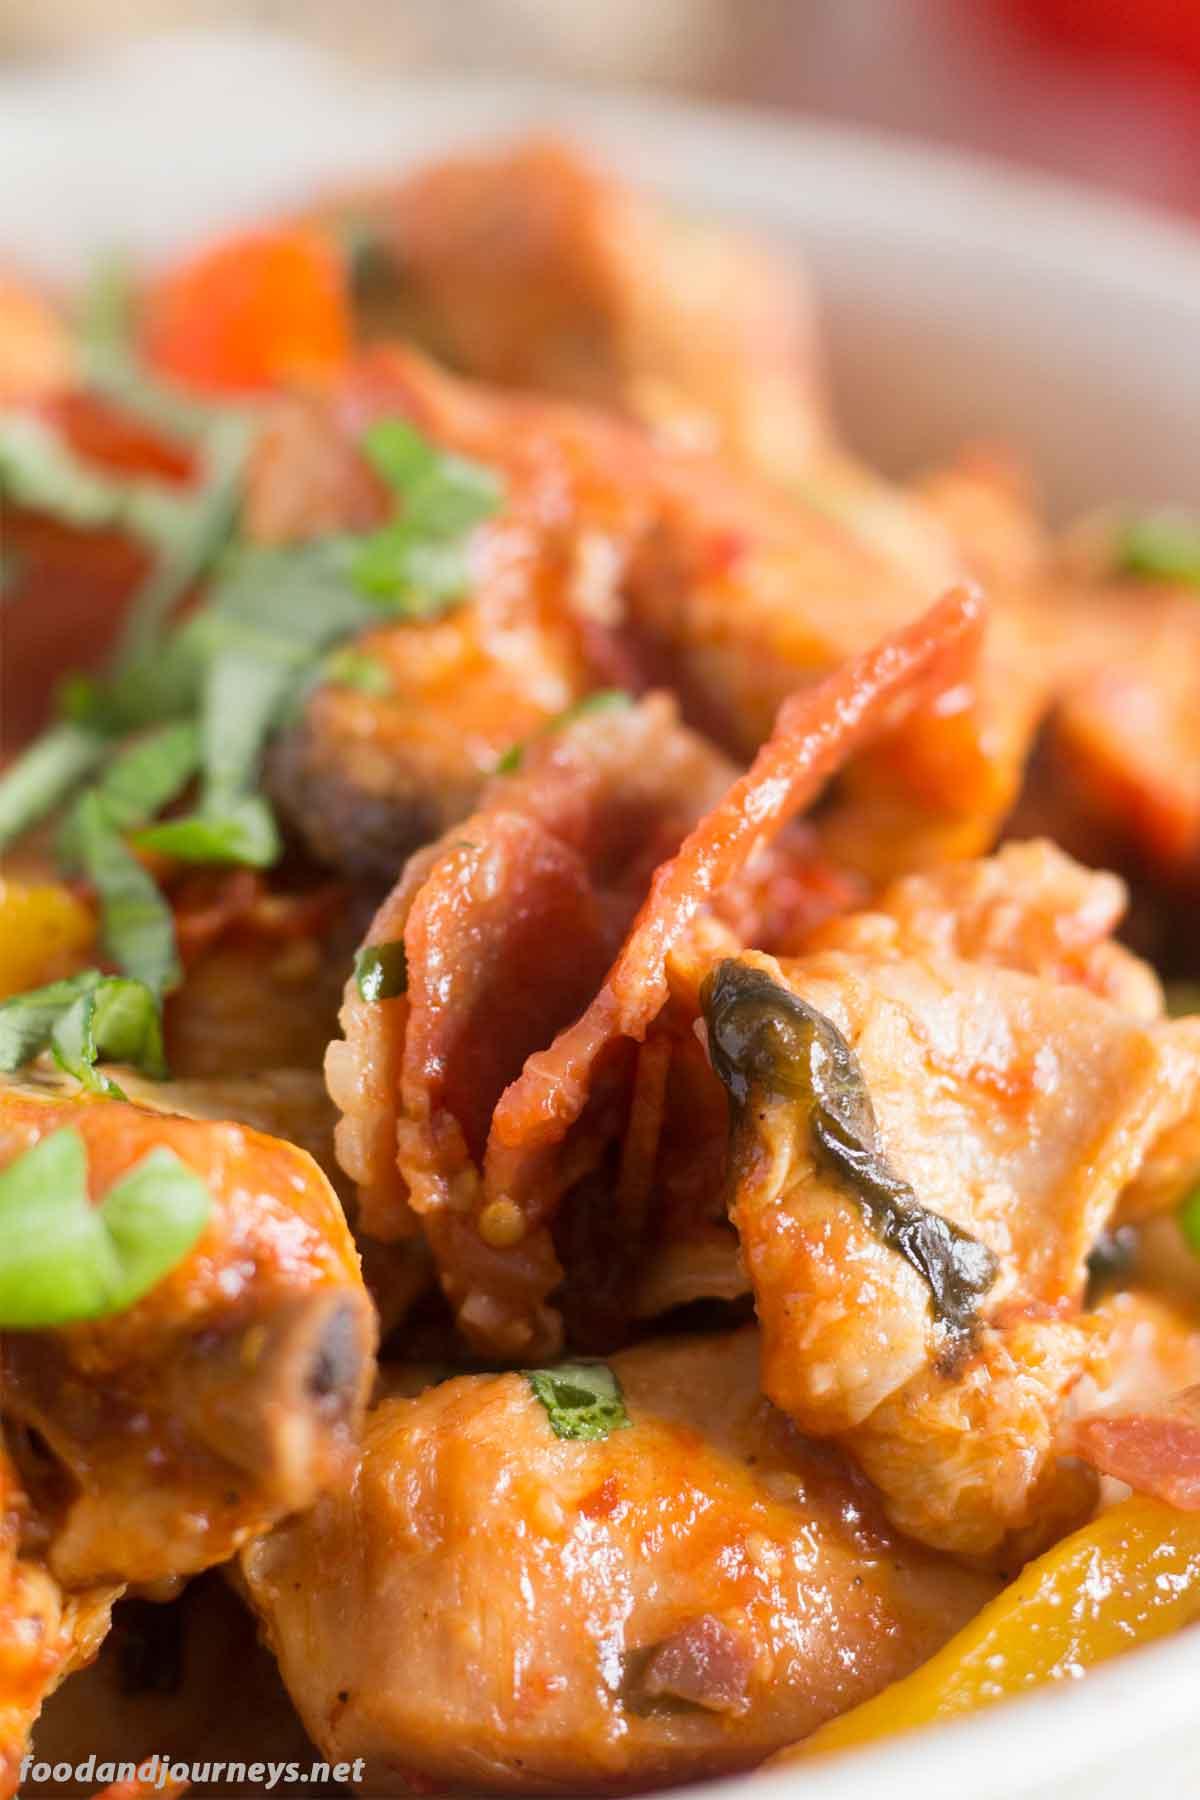 A closer image of Pollo alla Romana highlighting the ingredients|foodandjourneys.net